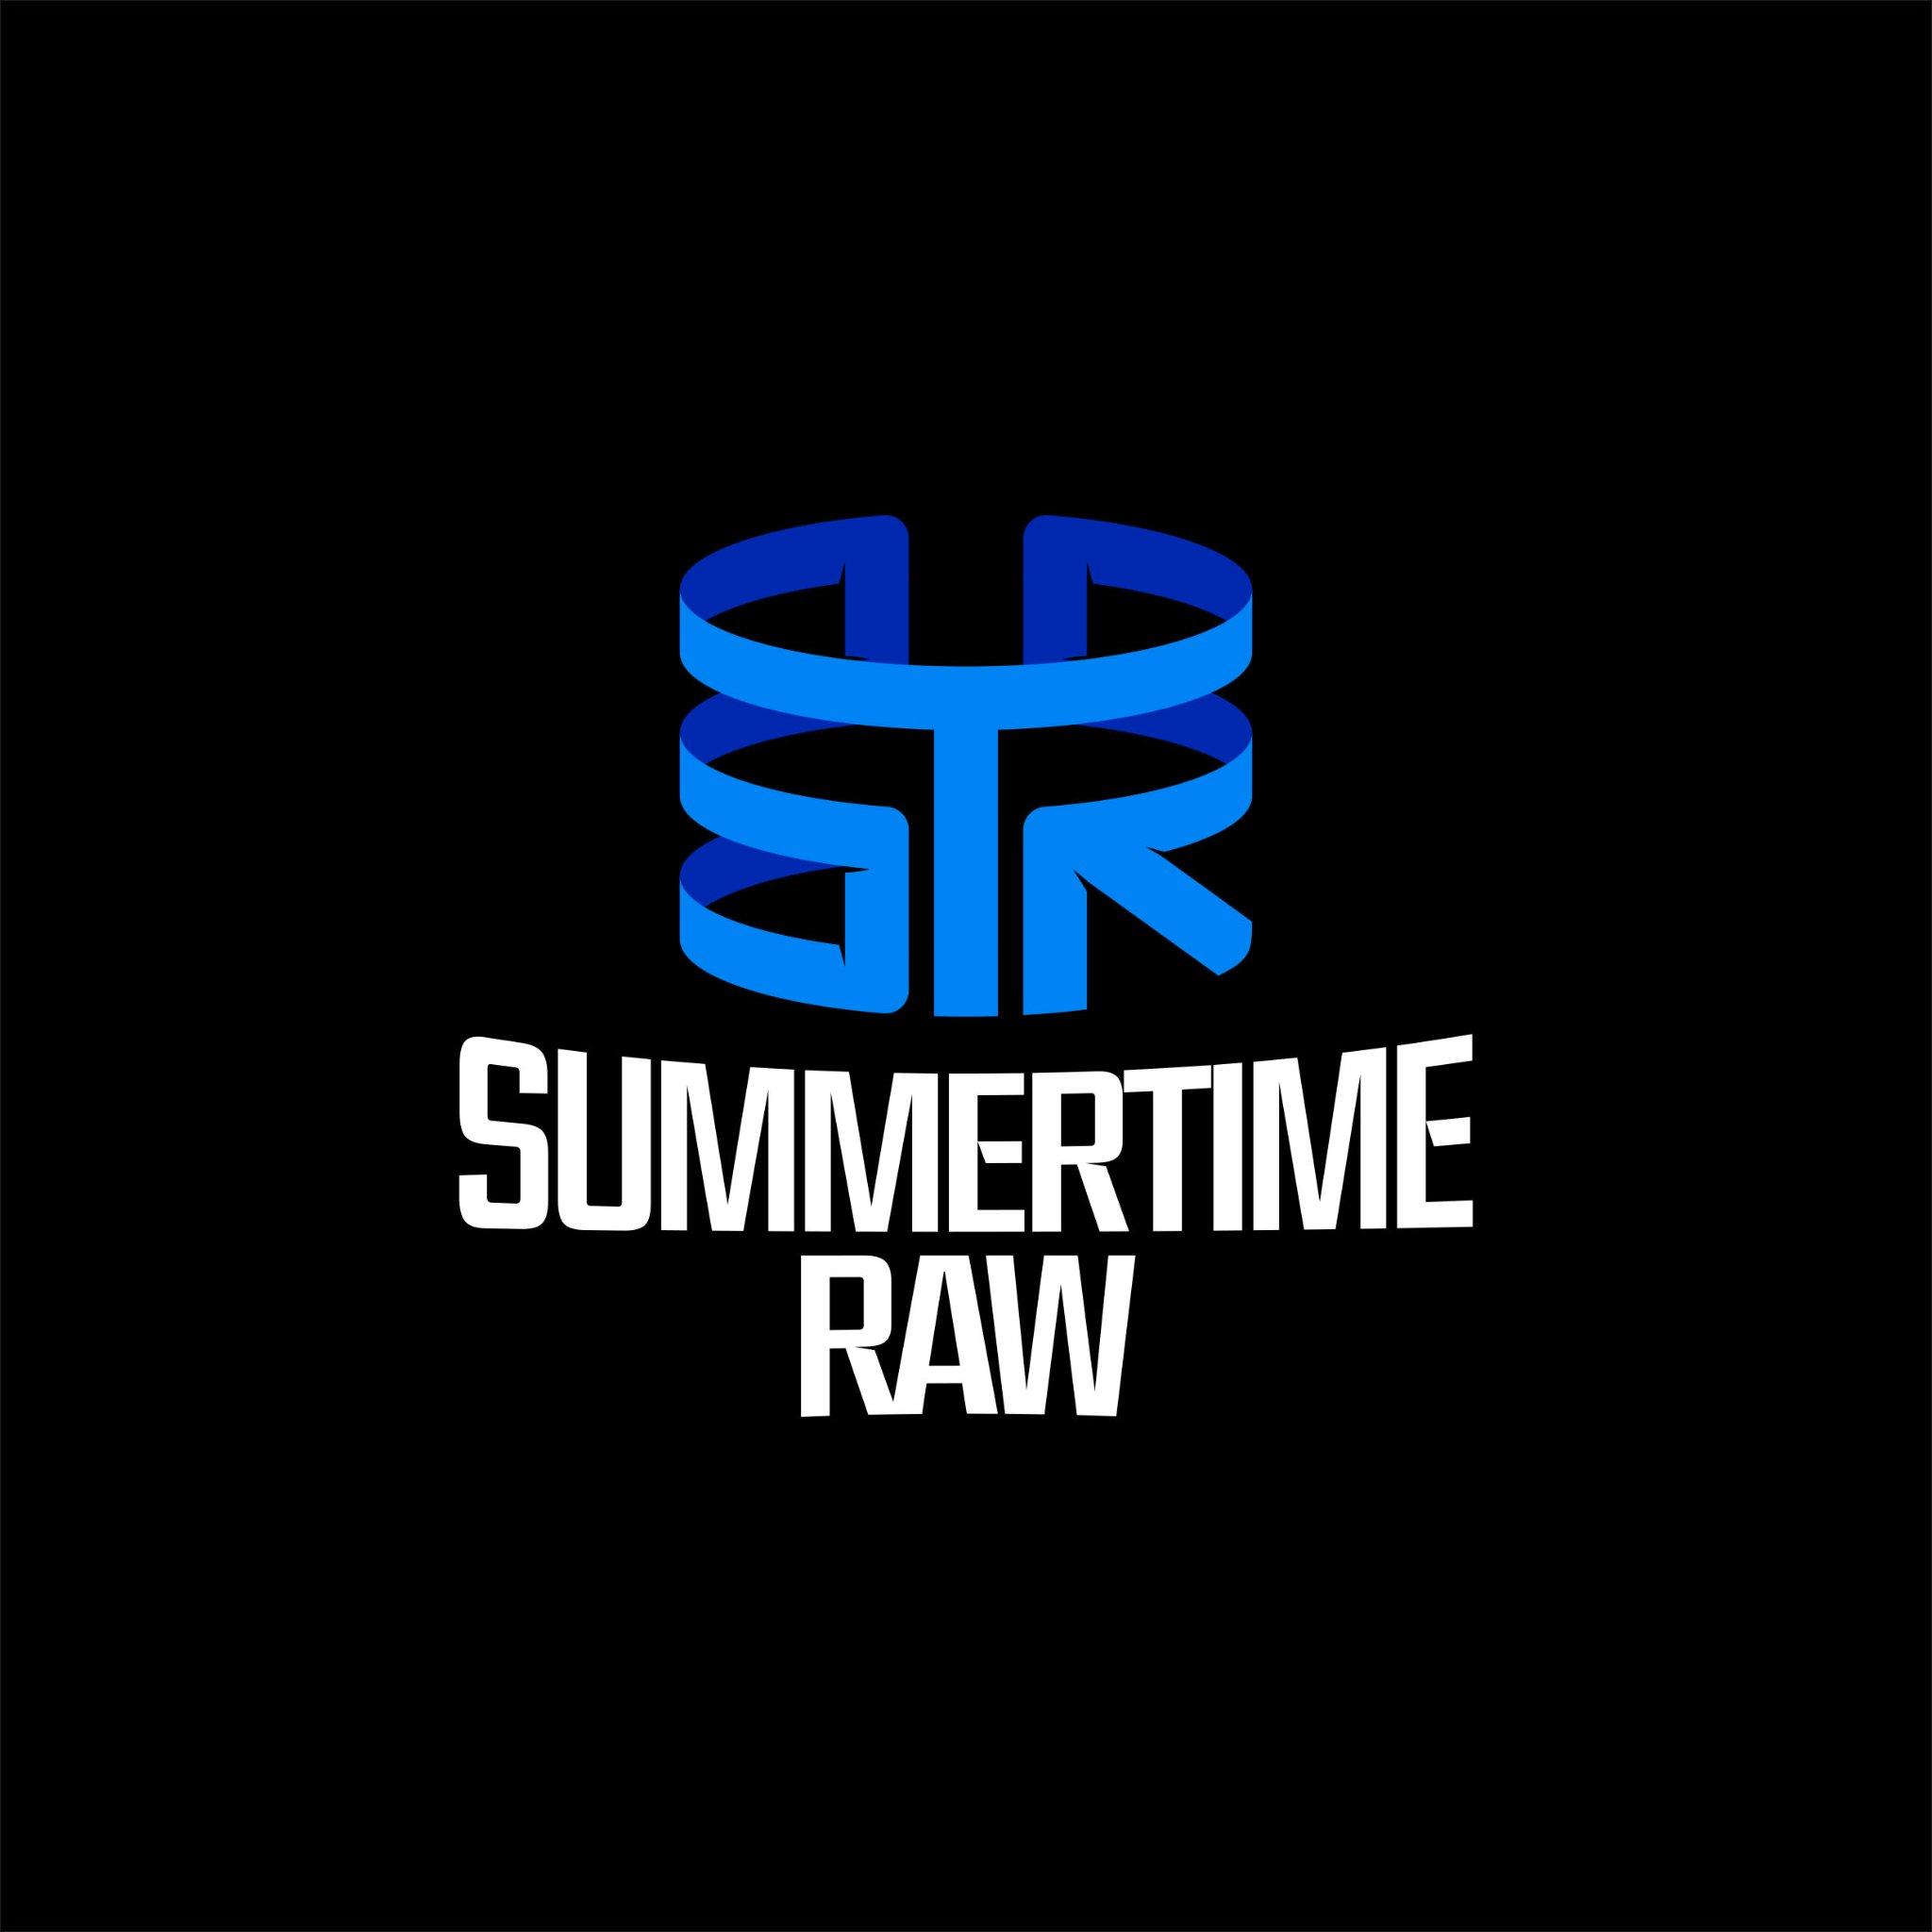 Summertime Raw